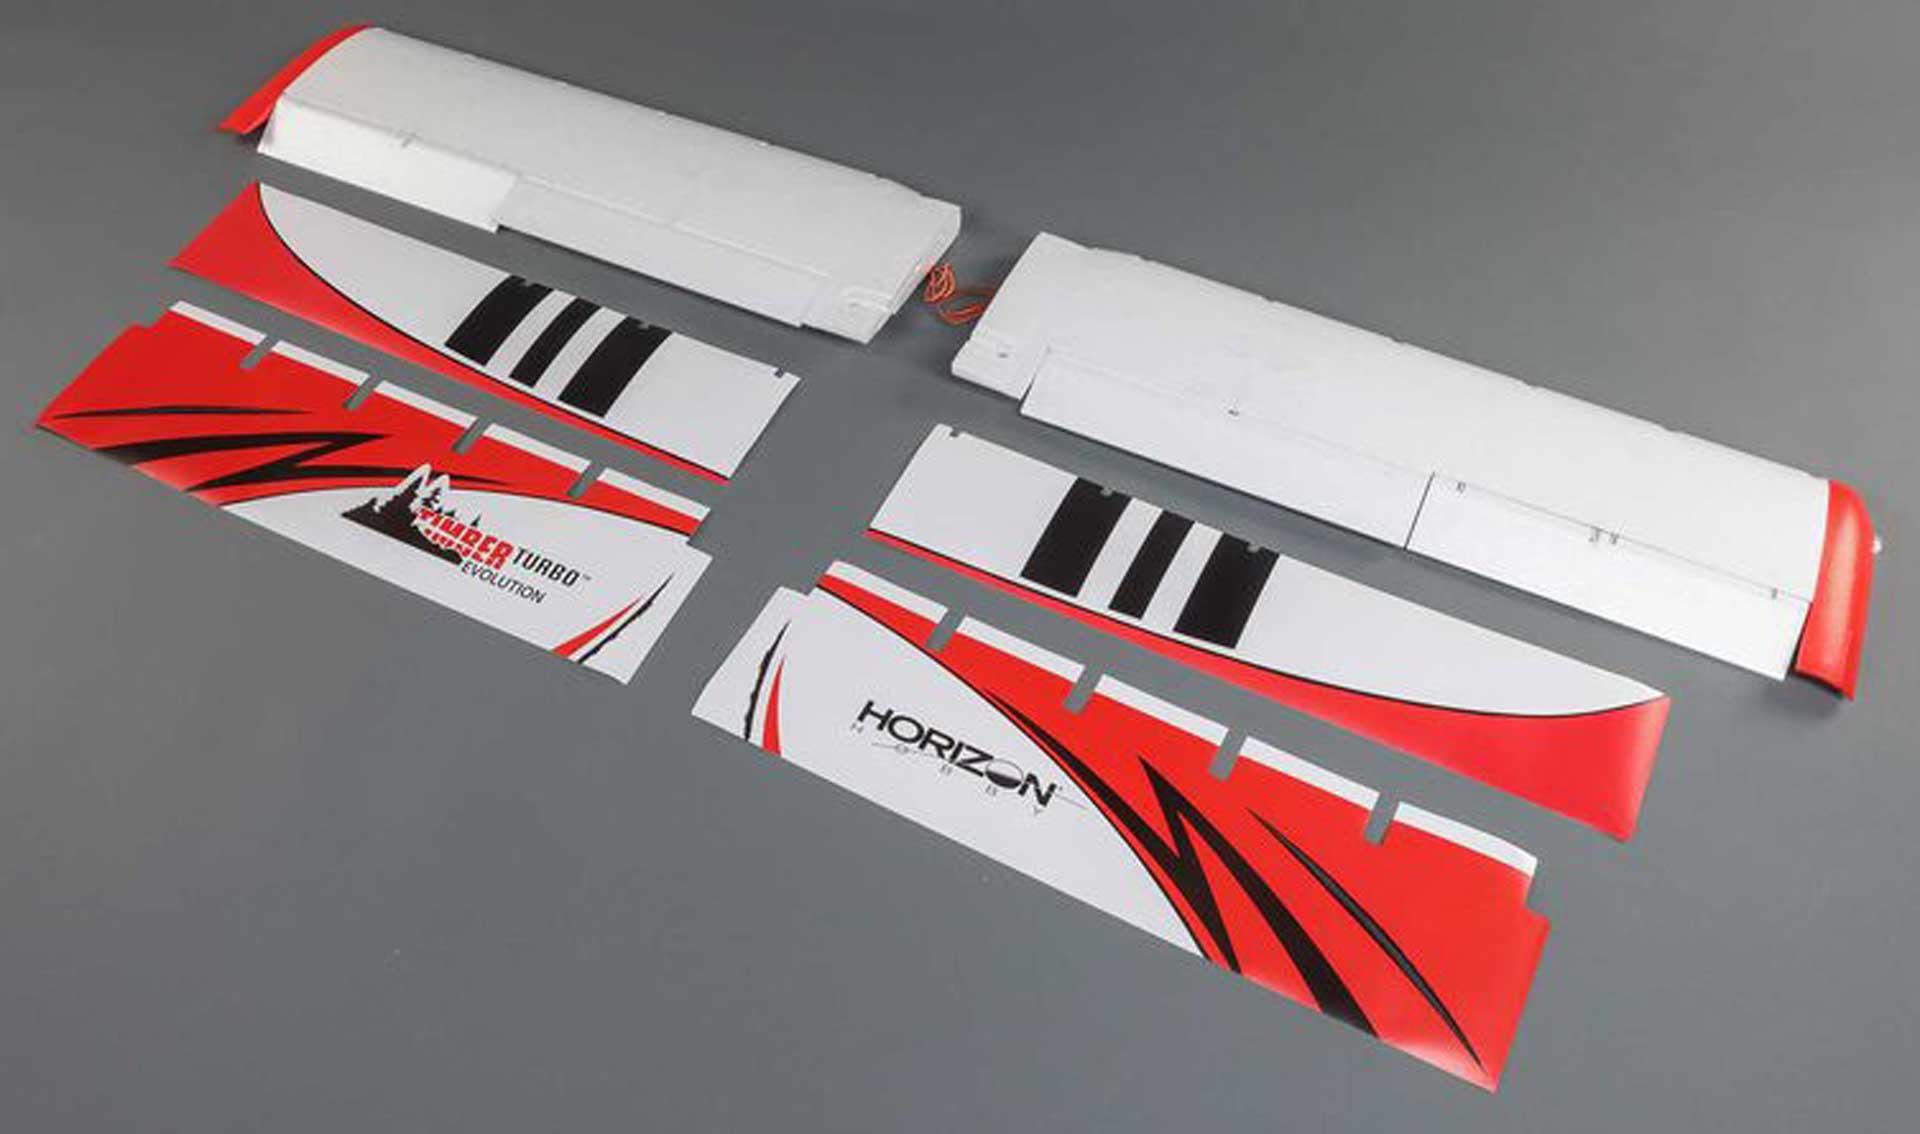 E-Flite Wing: Turbo Timber Evolution 1.5m